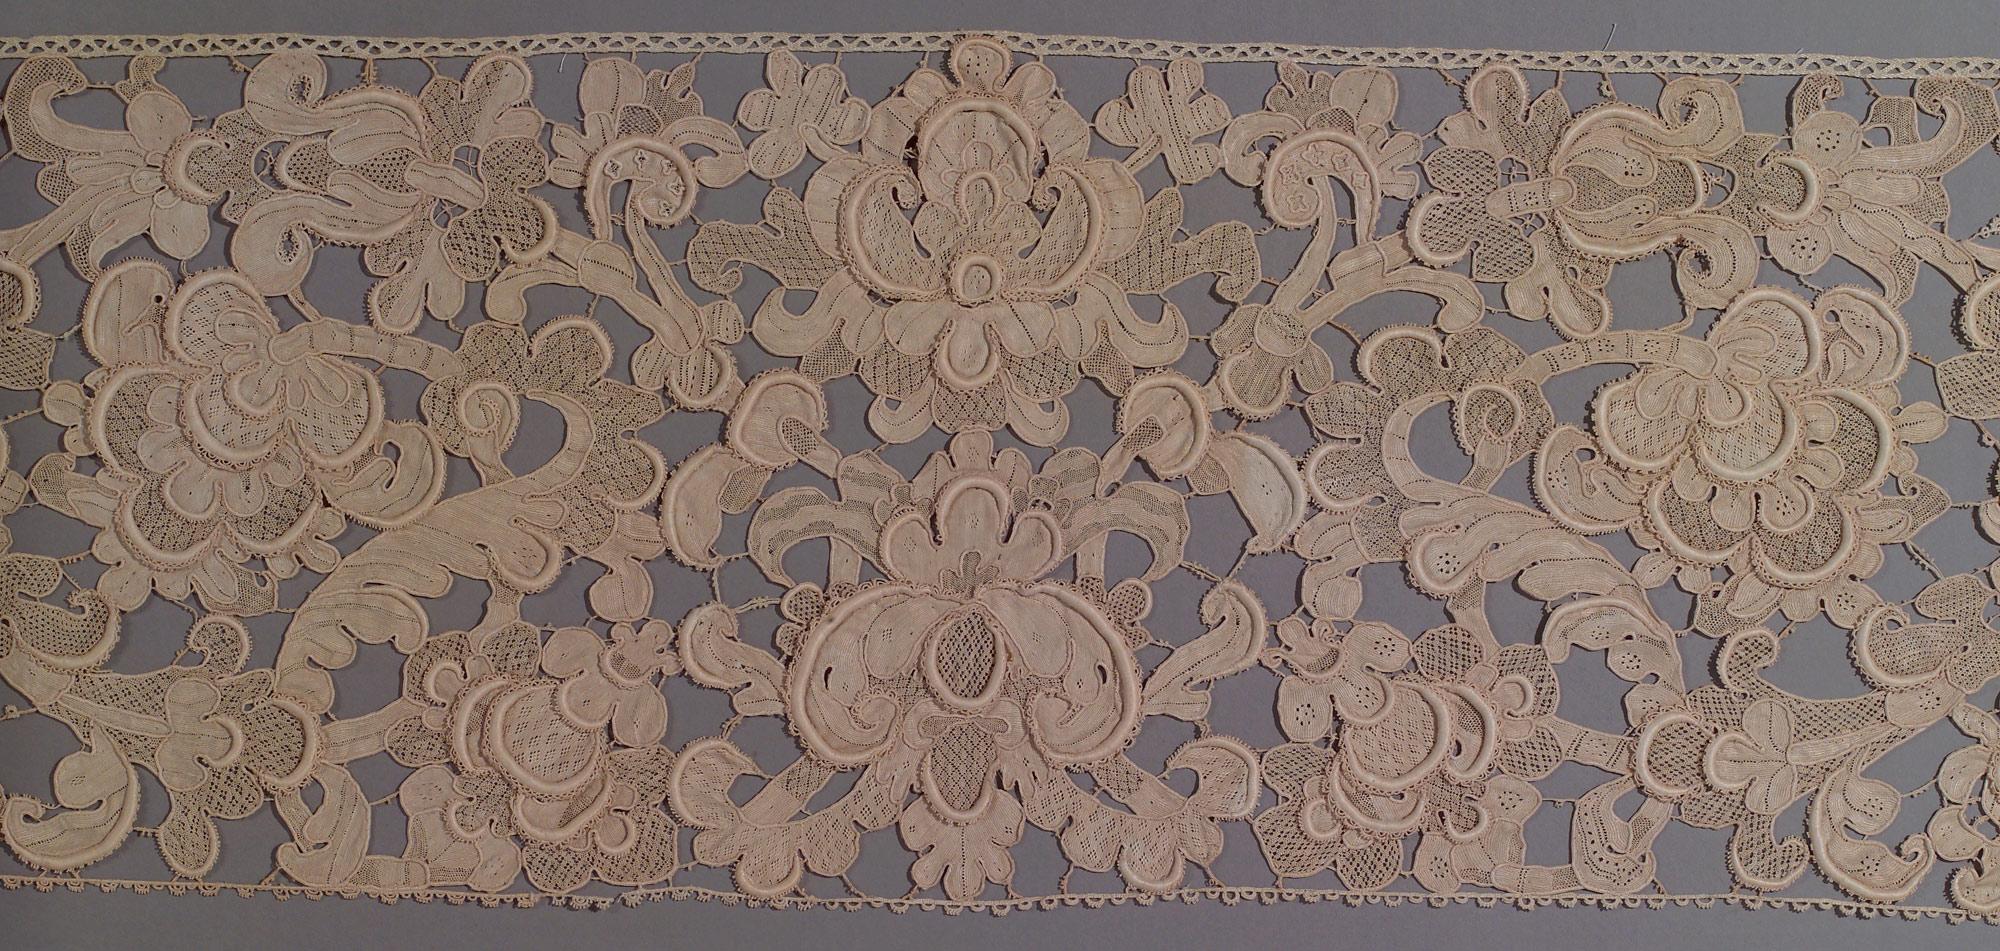 textile production in europe lace 1600 u20131800 essay heilbrunn